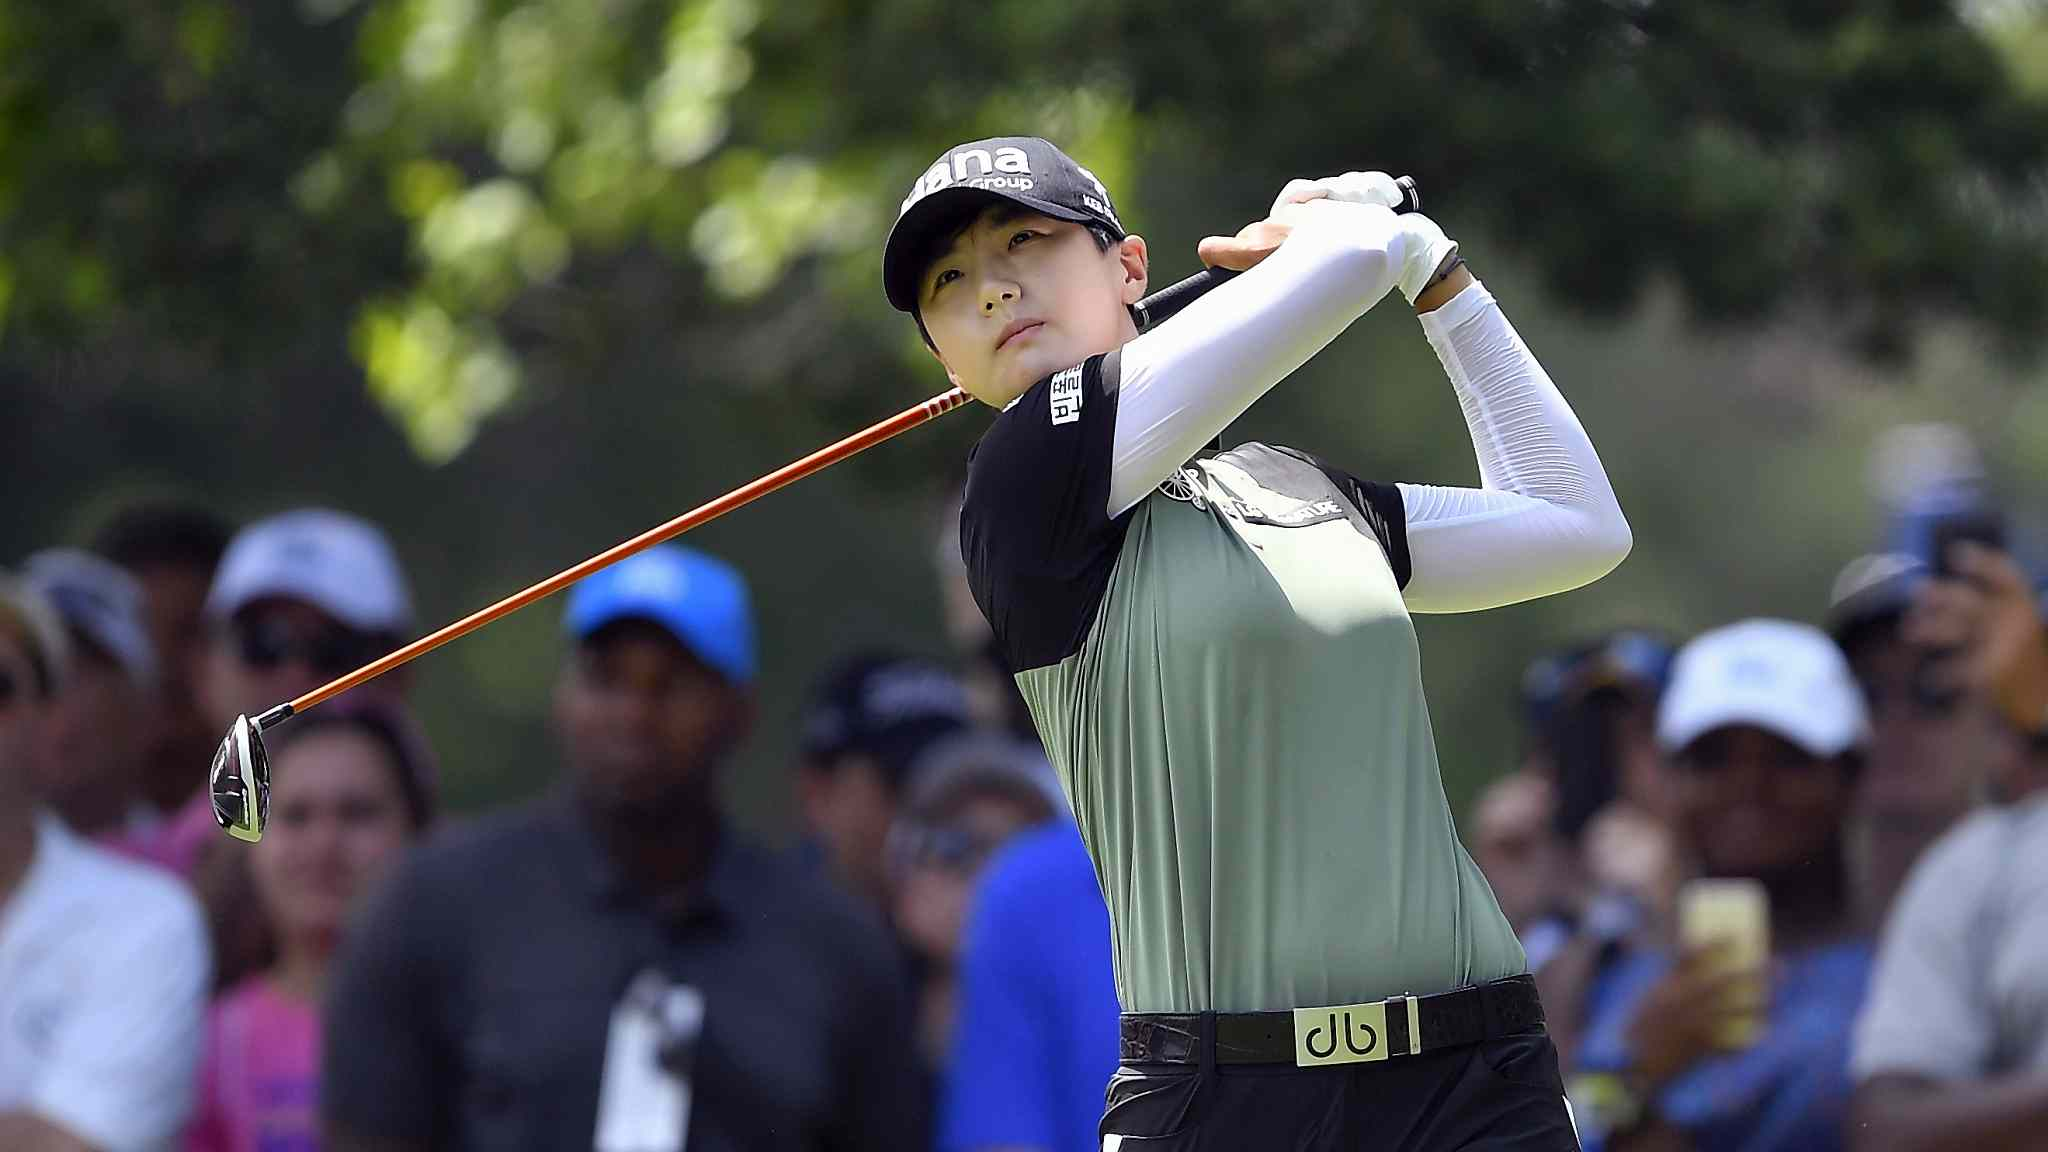 HSBC Women's World Championship golf cancelled over virus